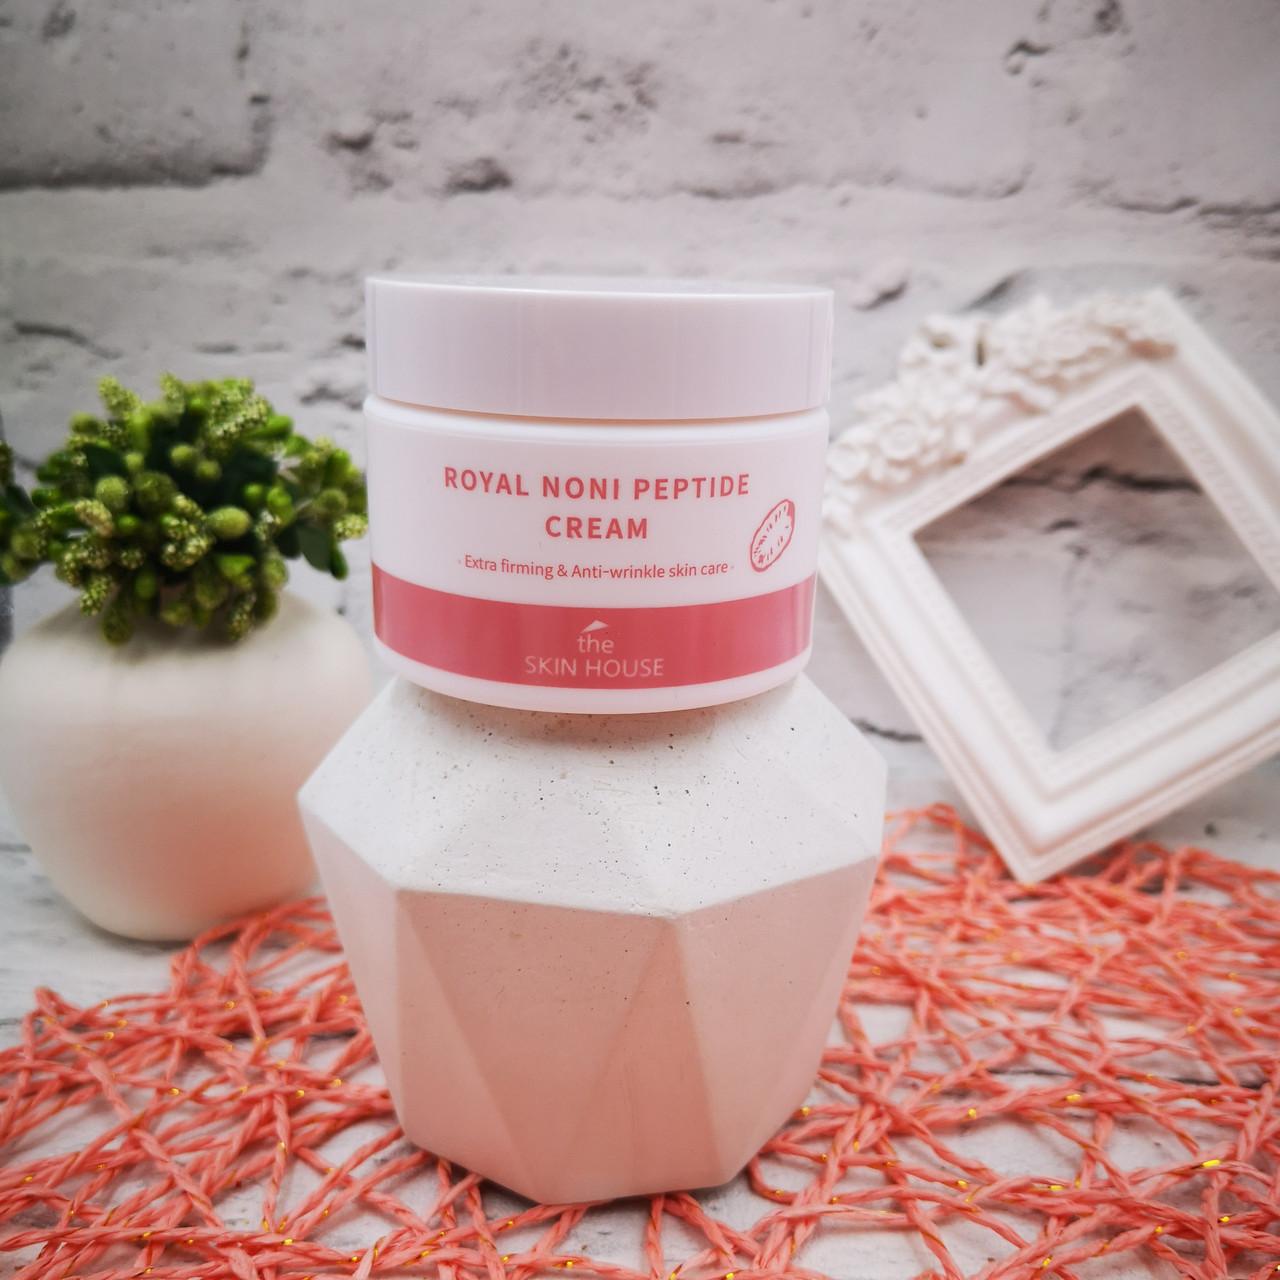 Укрепляющий крем The Skin House Royal Noni Peptide Cream